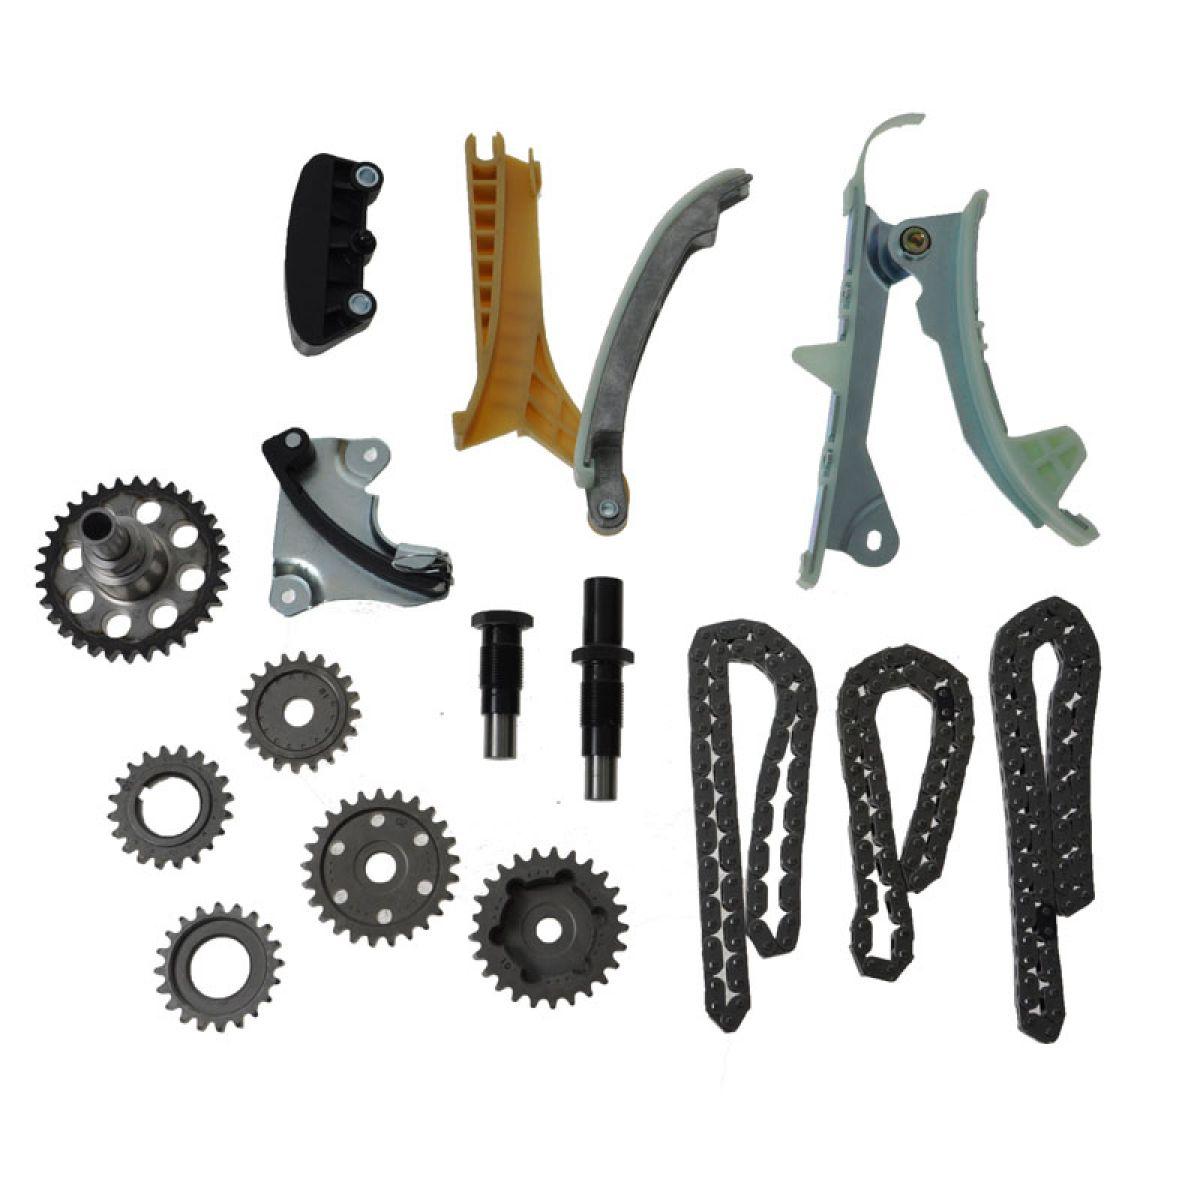 Timing Chain Tensioner Restrictor Set Kit For Explorer